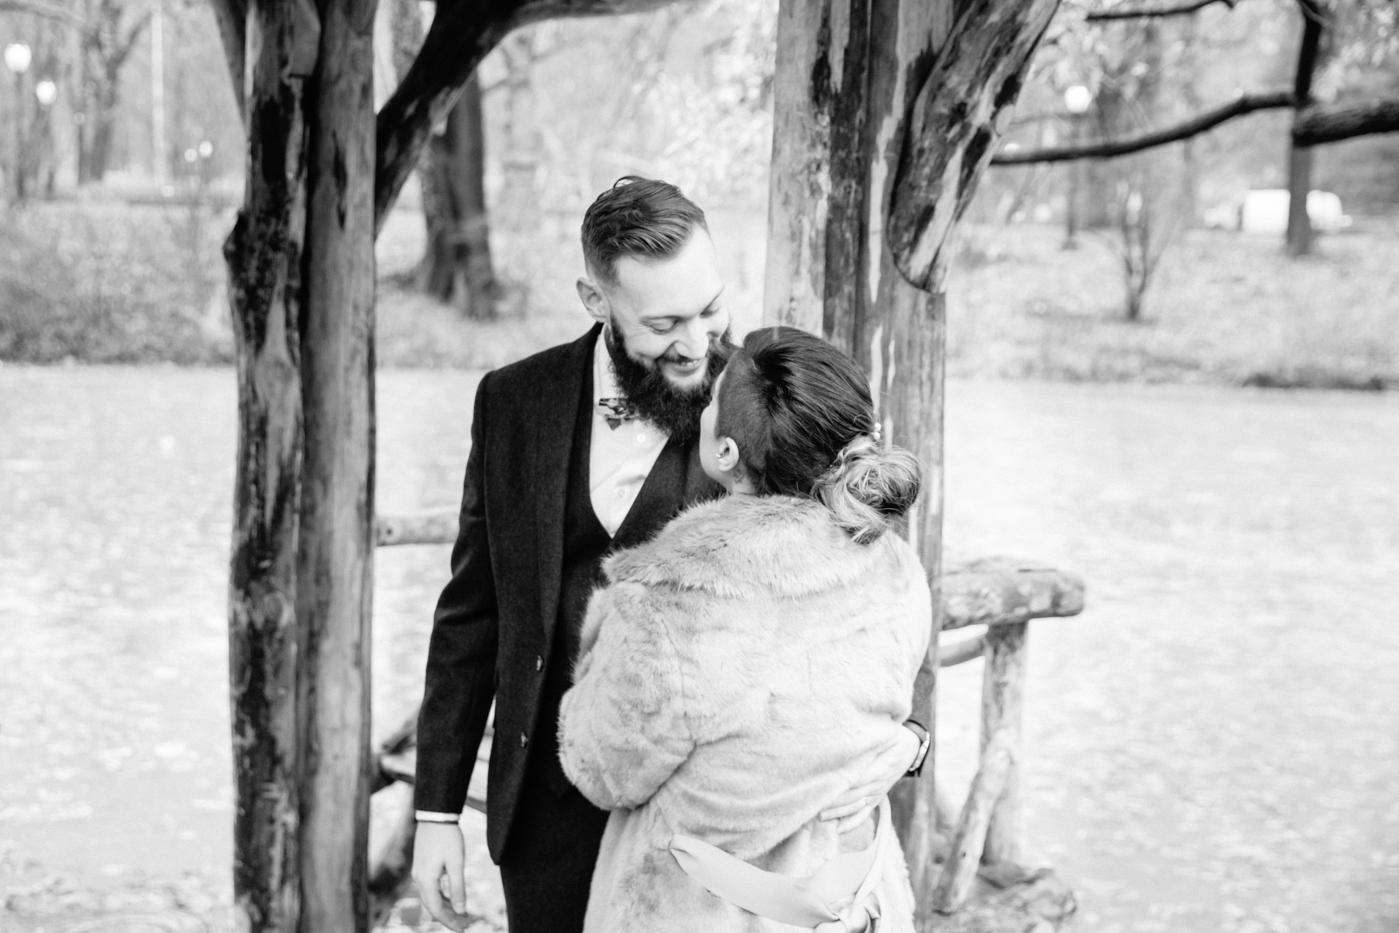 Central-park-wedding-by-Tanya-Isaeva-65.jpg